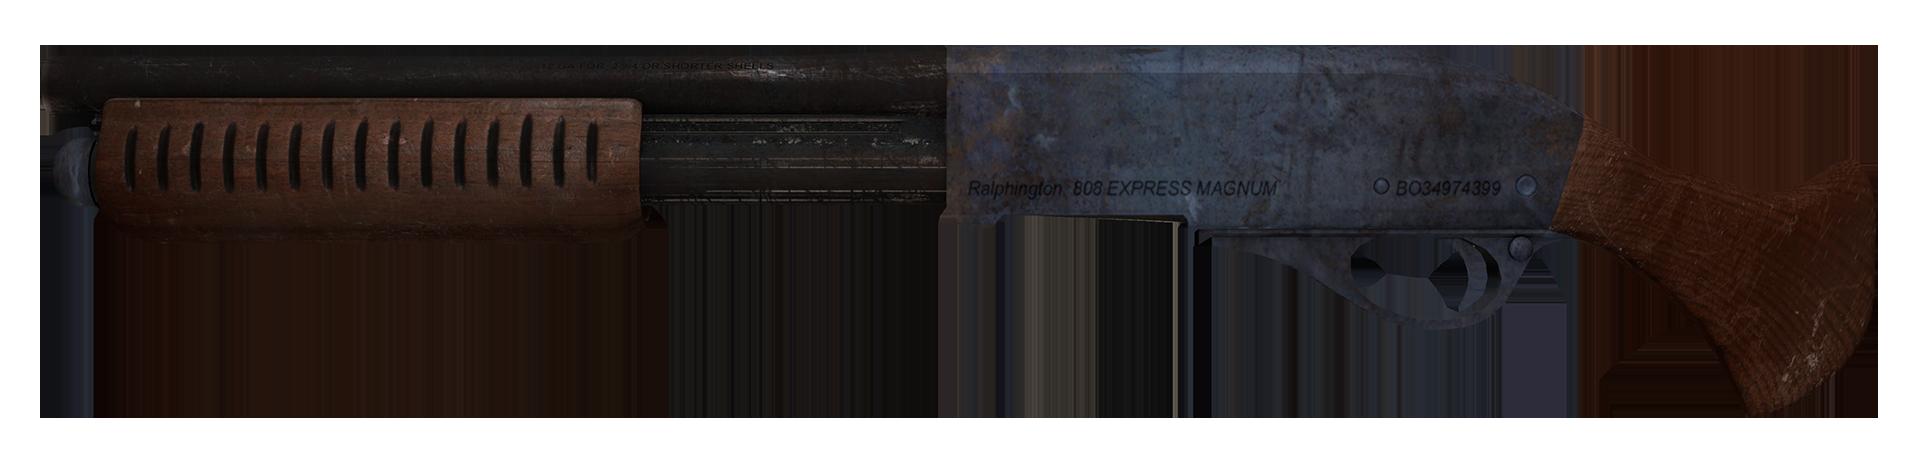 Sawed-Off Rust Coat Large Rendering